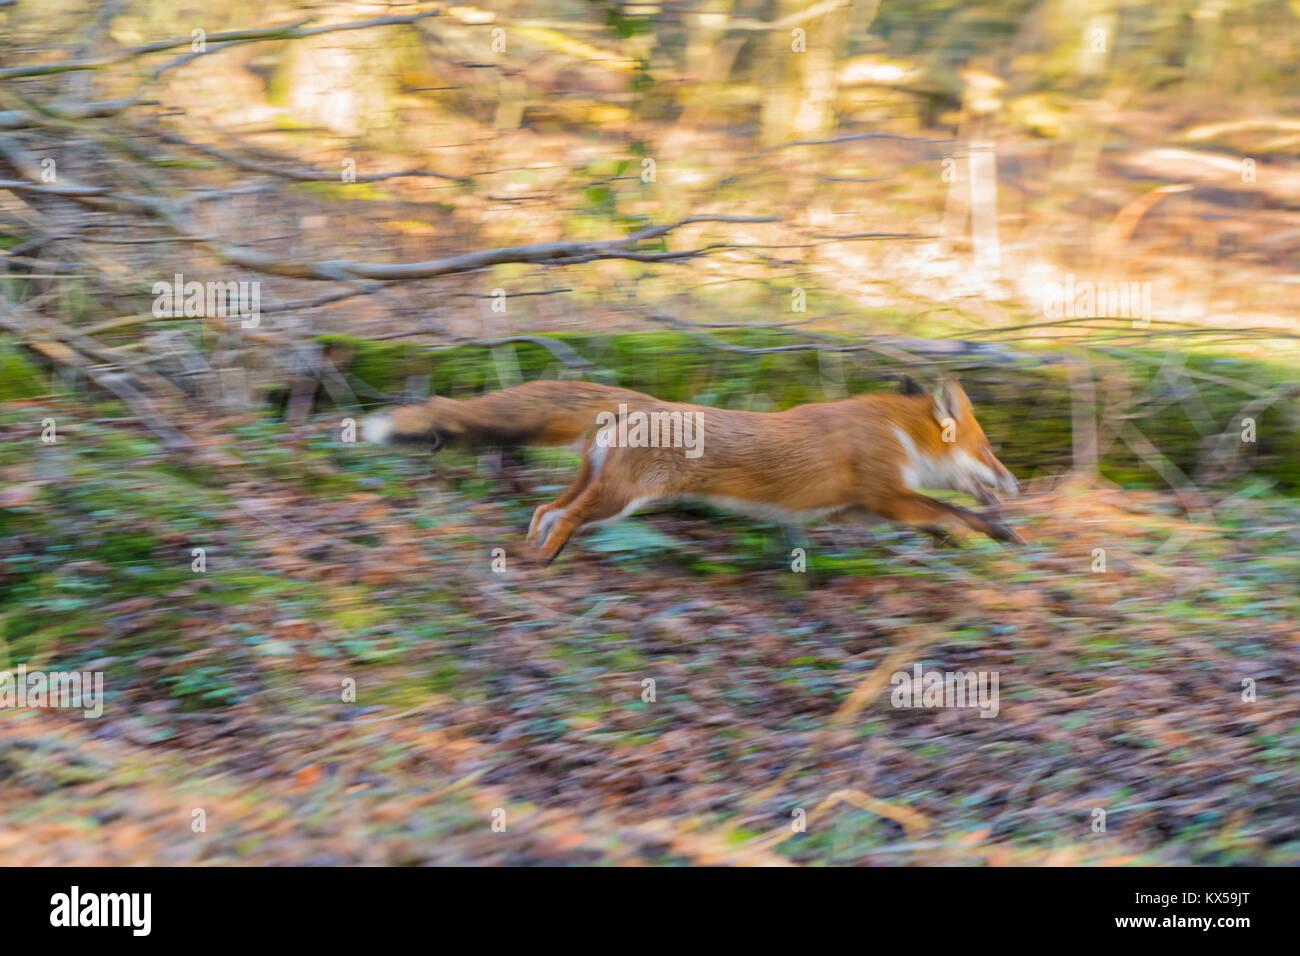 Rosso europeo volpe (Vulpes vulpes) in esecuzione attraverso boschi nel Herefordshire UK campagna Immagini Stock